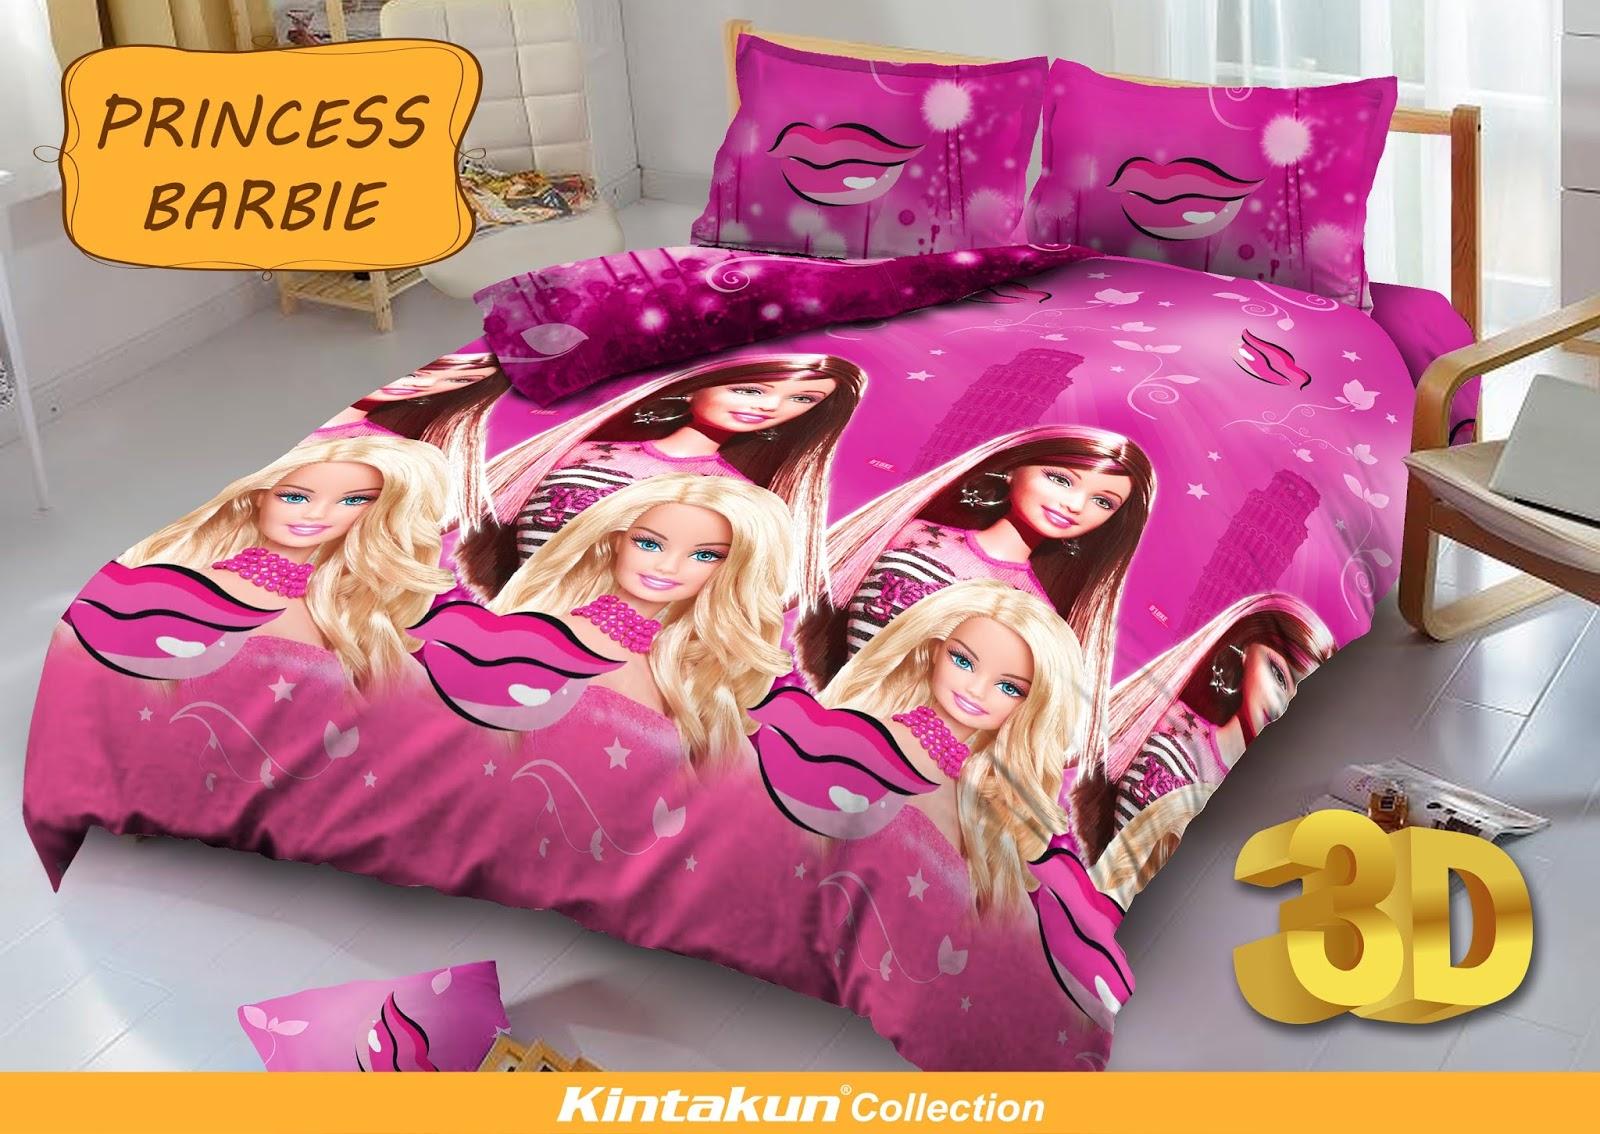 Pusat Grosir Sprei Dan Bedcover Surabaya Murah Berkualitas Kintakun Dluxe 180 X 200 B2 King Barbie Pop Star Princess